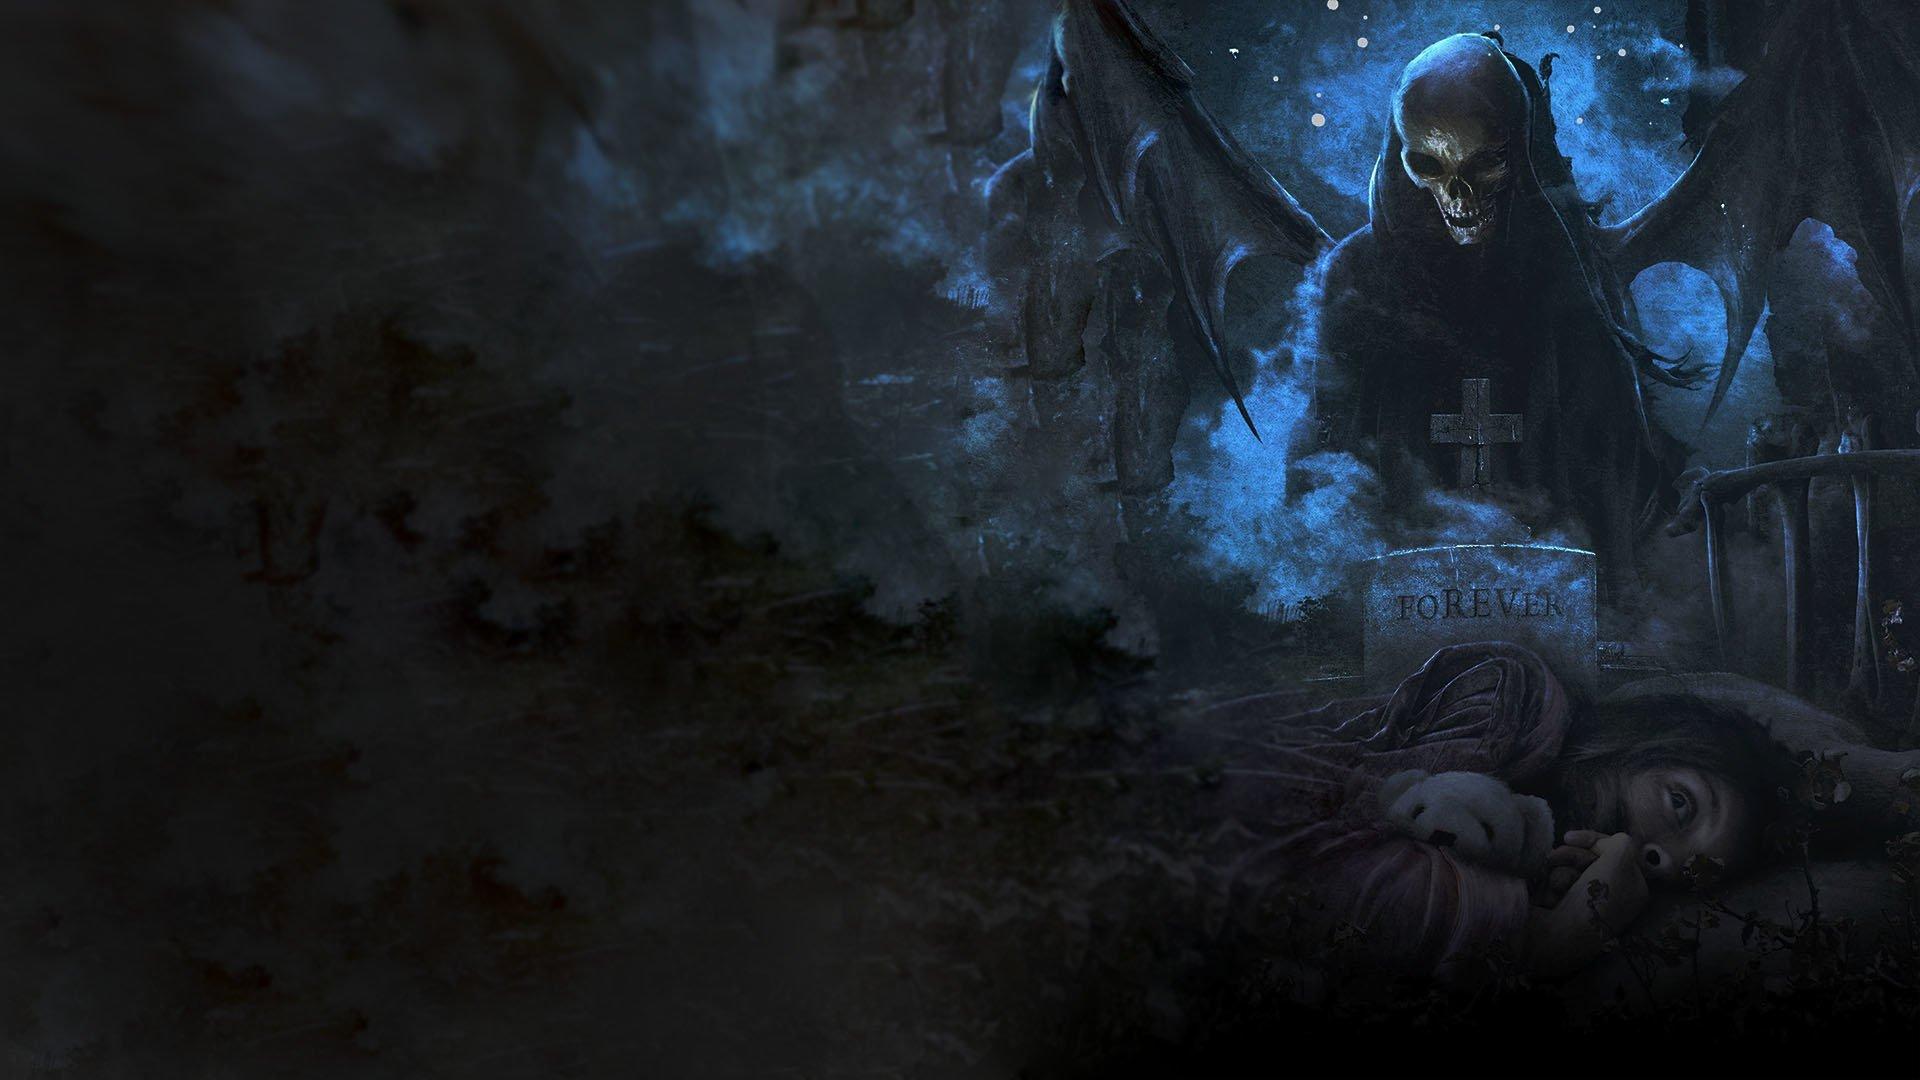 Avenged Sevenfold Hd Wallpaper Background Image 1920x1080 Id